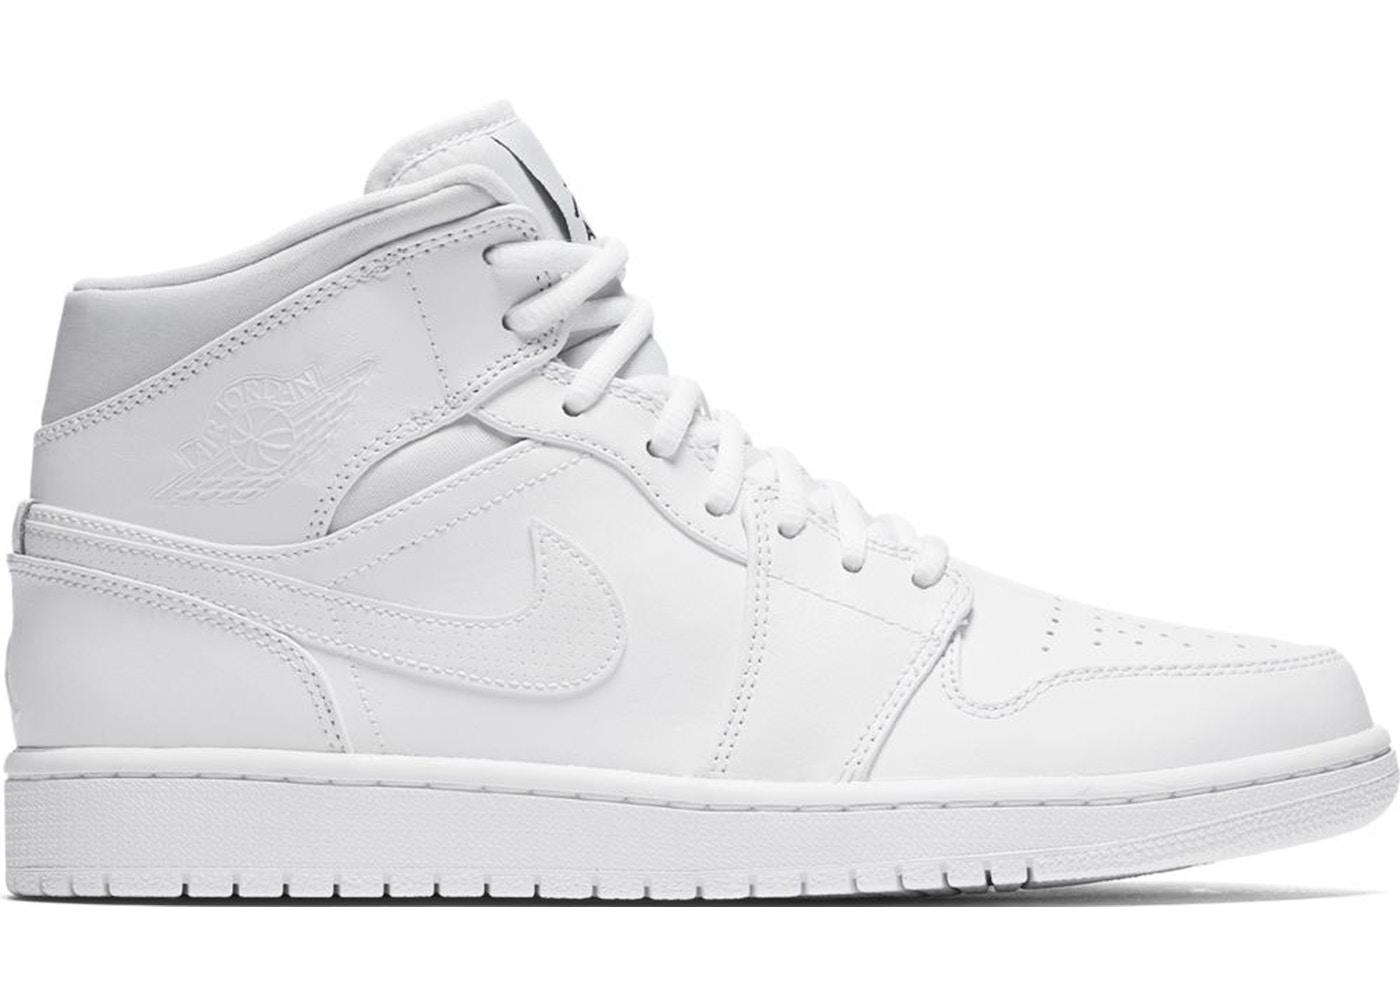 2c2241fd8fbd Air Jordan 1 Size 9 Shoes - Volatility